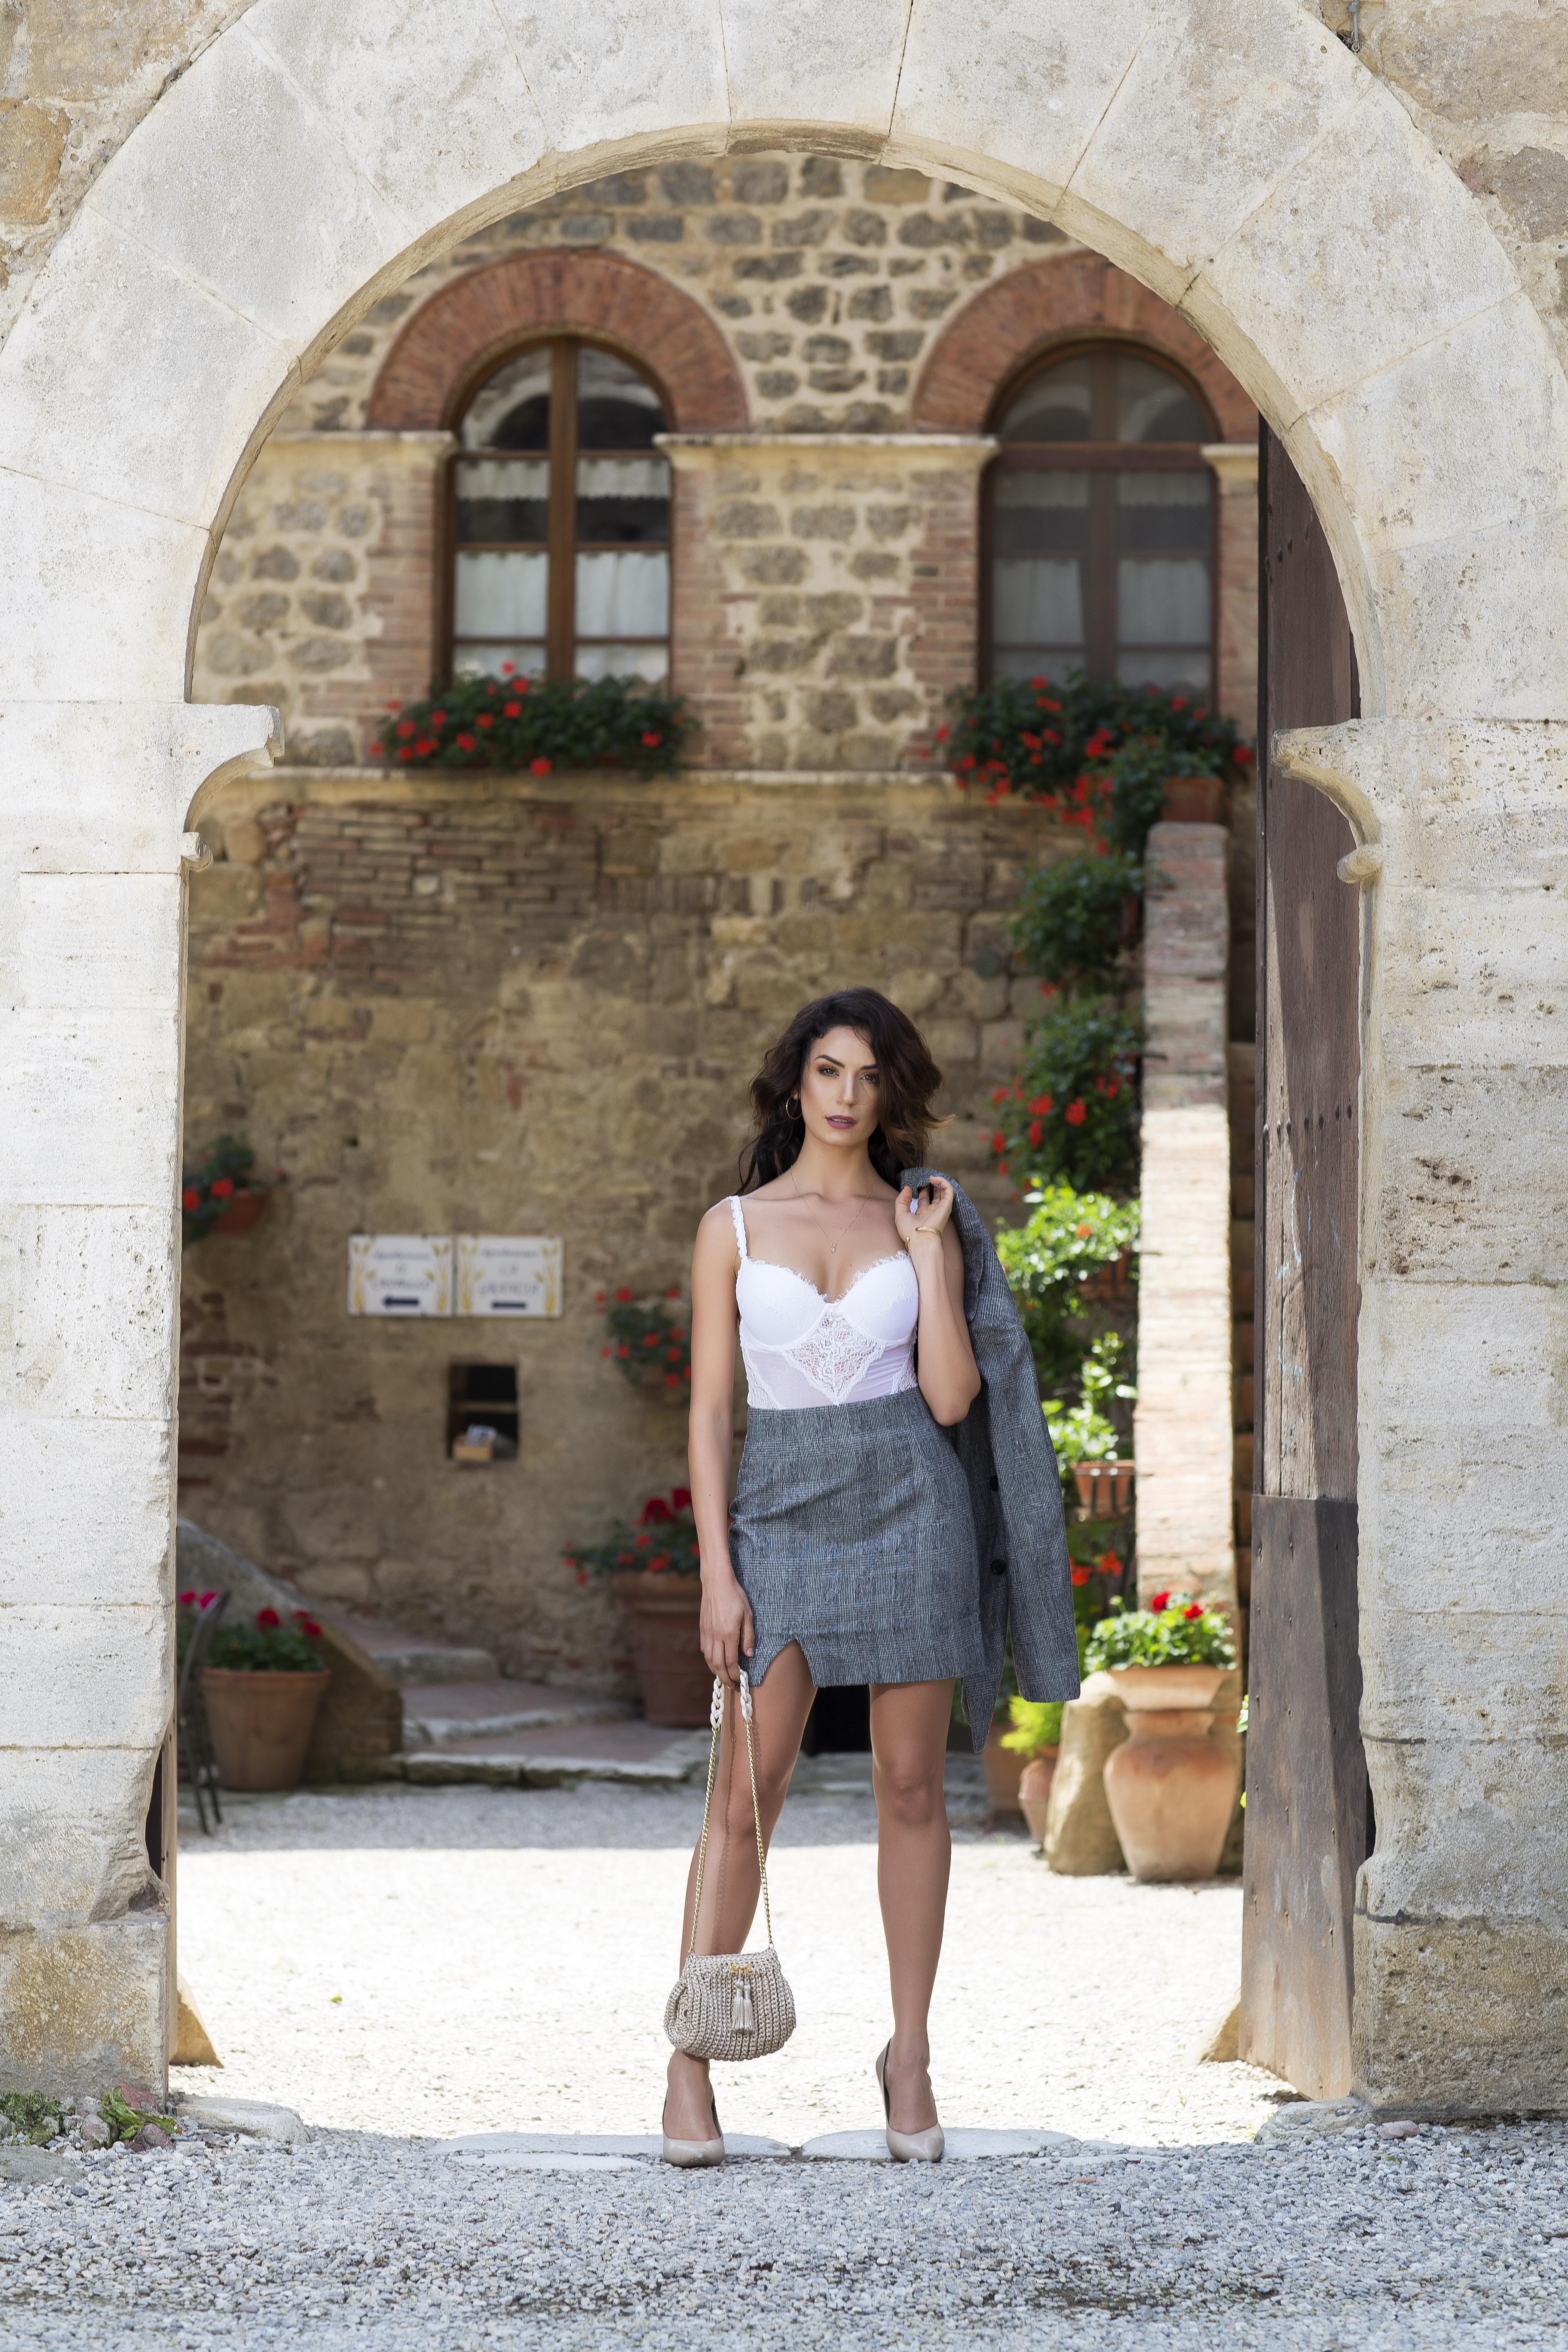 Toscana, Itália - 2018